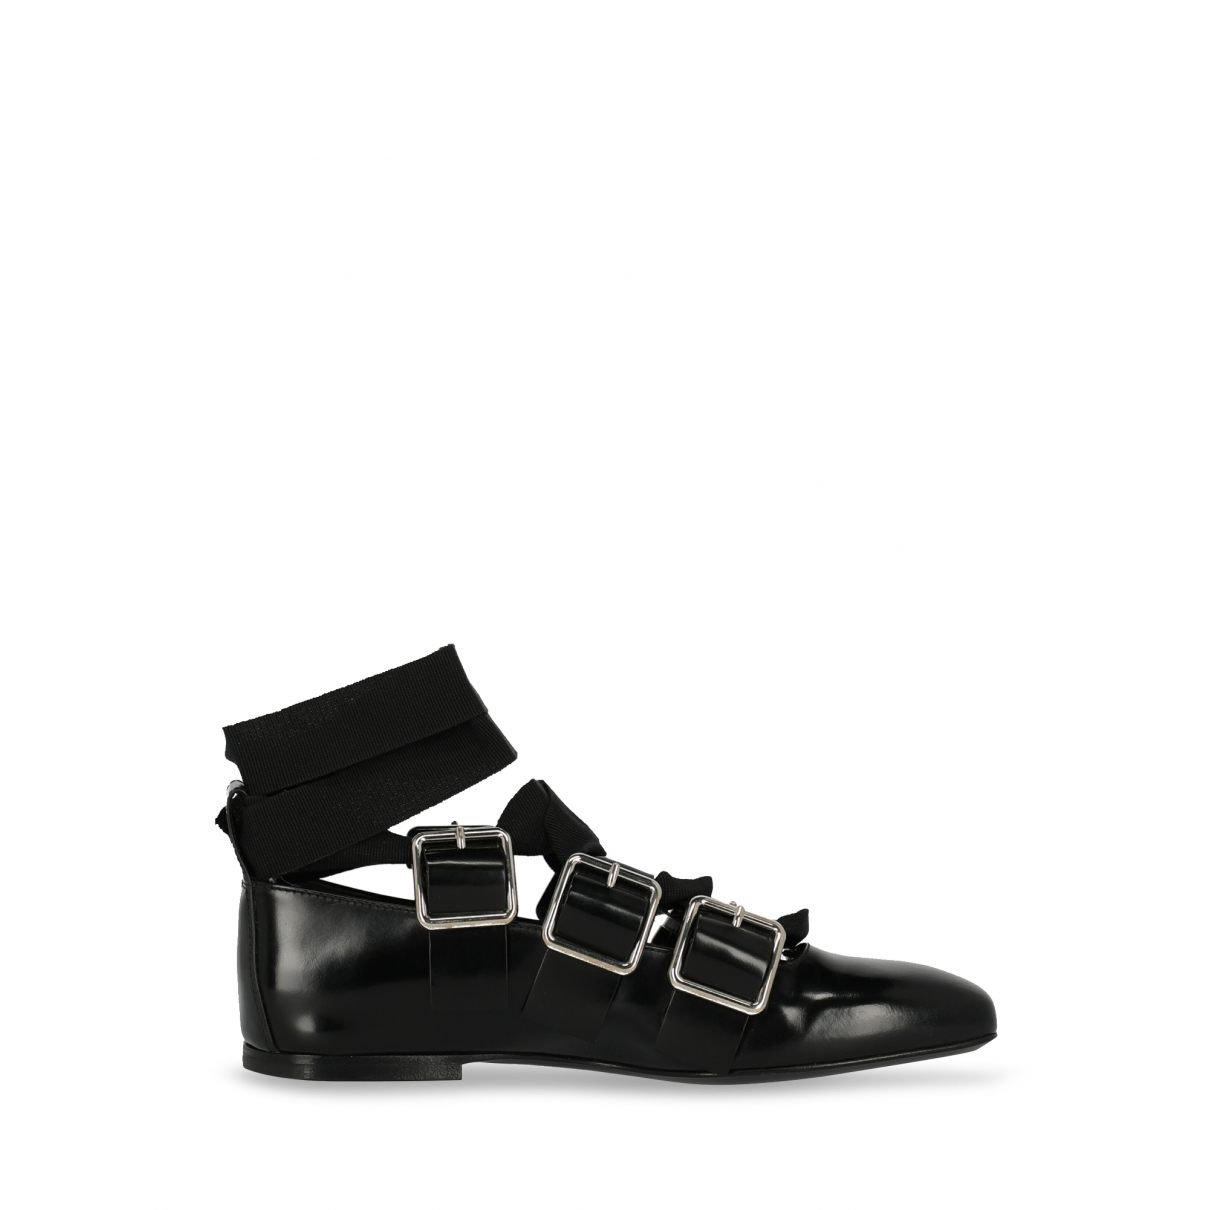 Jil Sander \N Black Leather Ballet flats for Women 35.5 IT